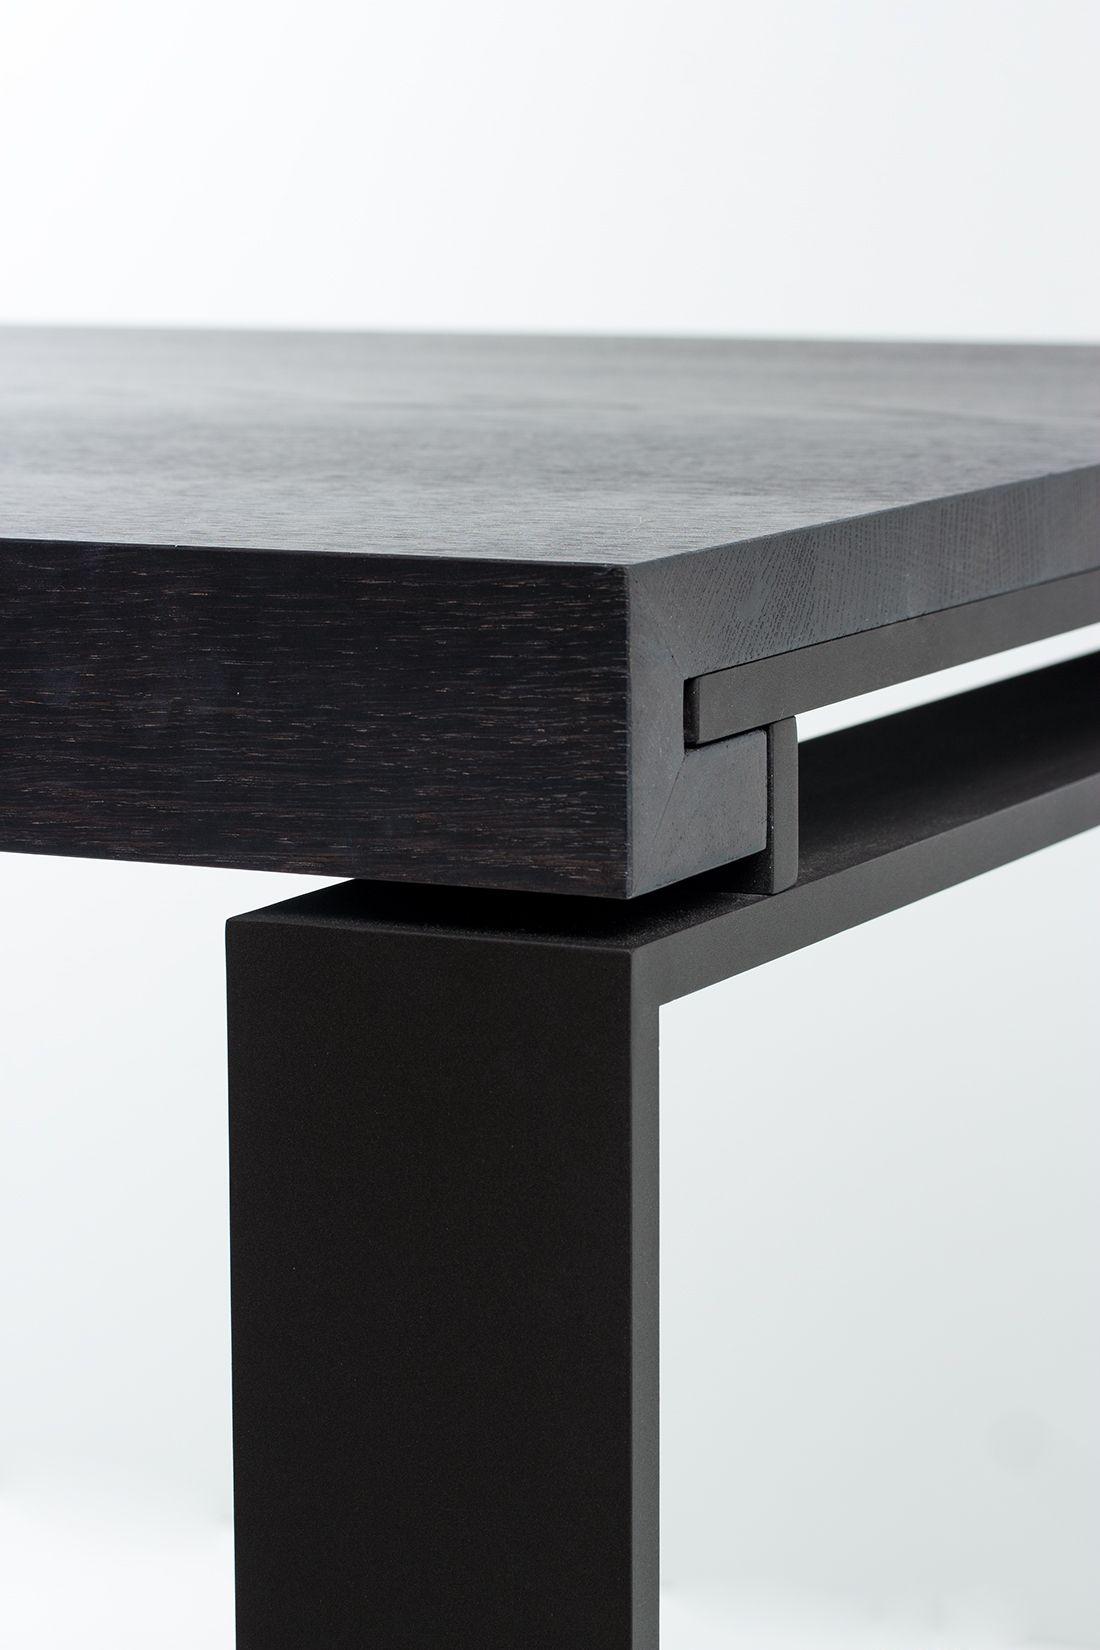 Modern wood side table  PAN TABLE I FORMA DESIGN by Reimann Design  jwellery  Pinterest